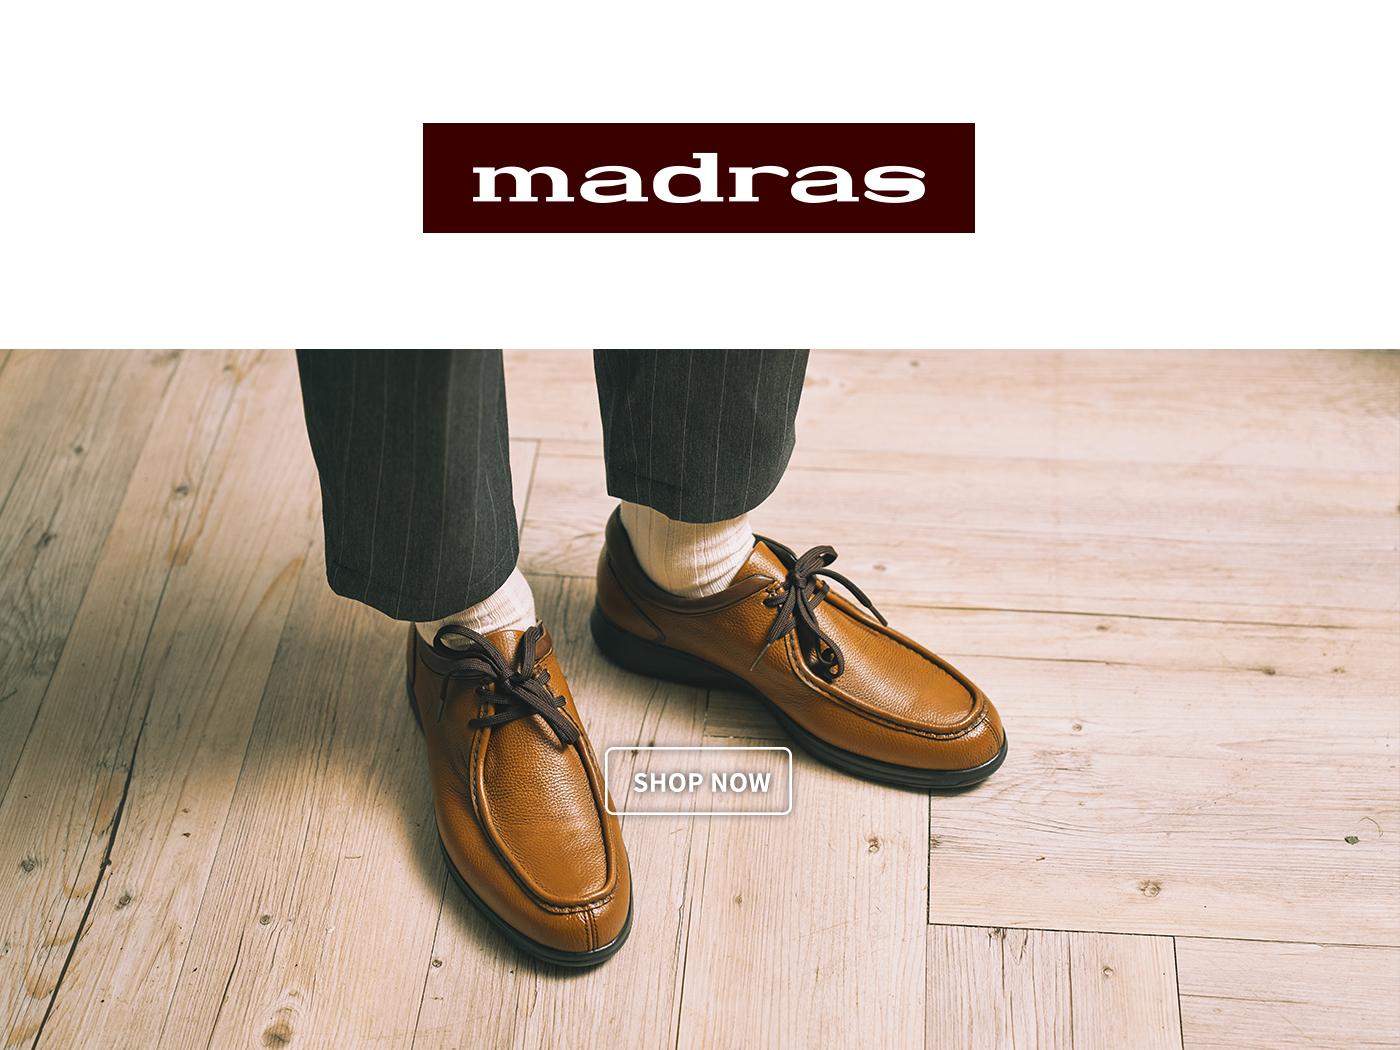 madras,madras 皮鞋,madras 靴,madras walk,madras 店舗,madras ゴアテックス,義大利皮鞋,小牛皮皮鞋,madras 台灣,madras 日本,madras 義大利